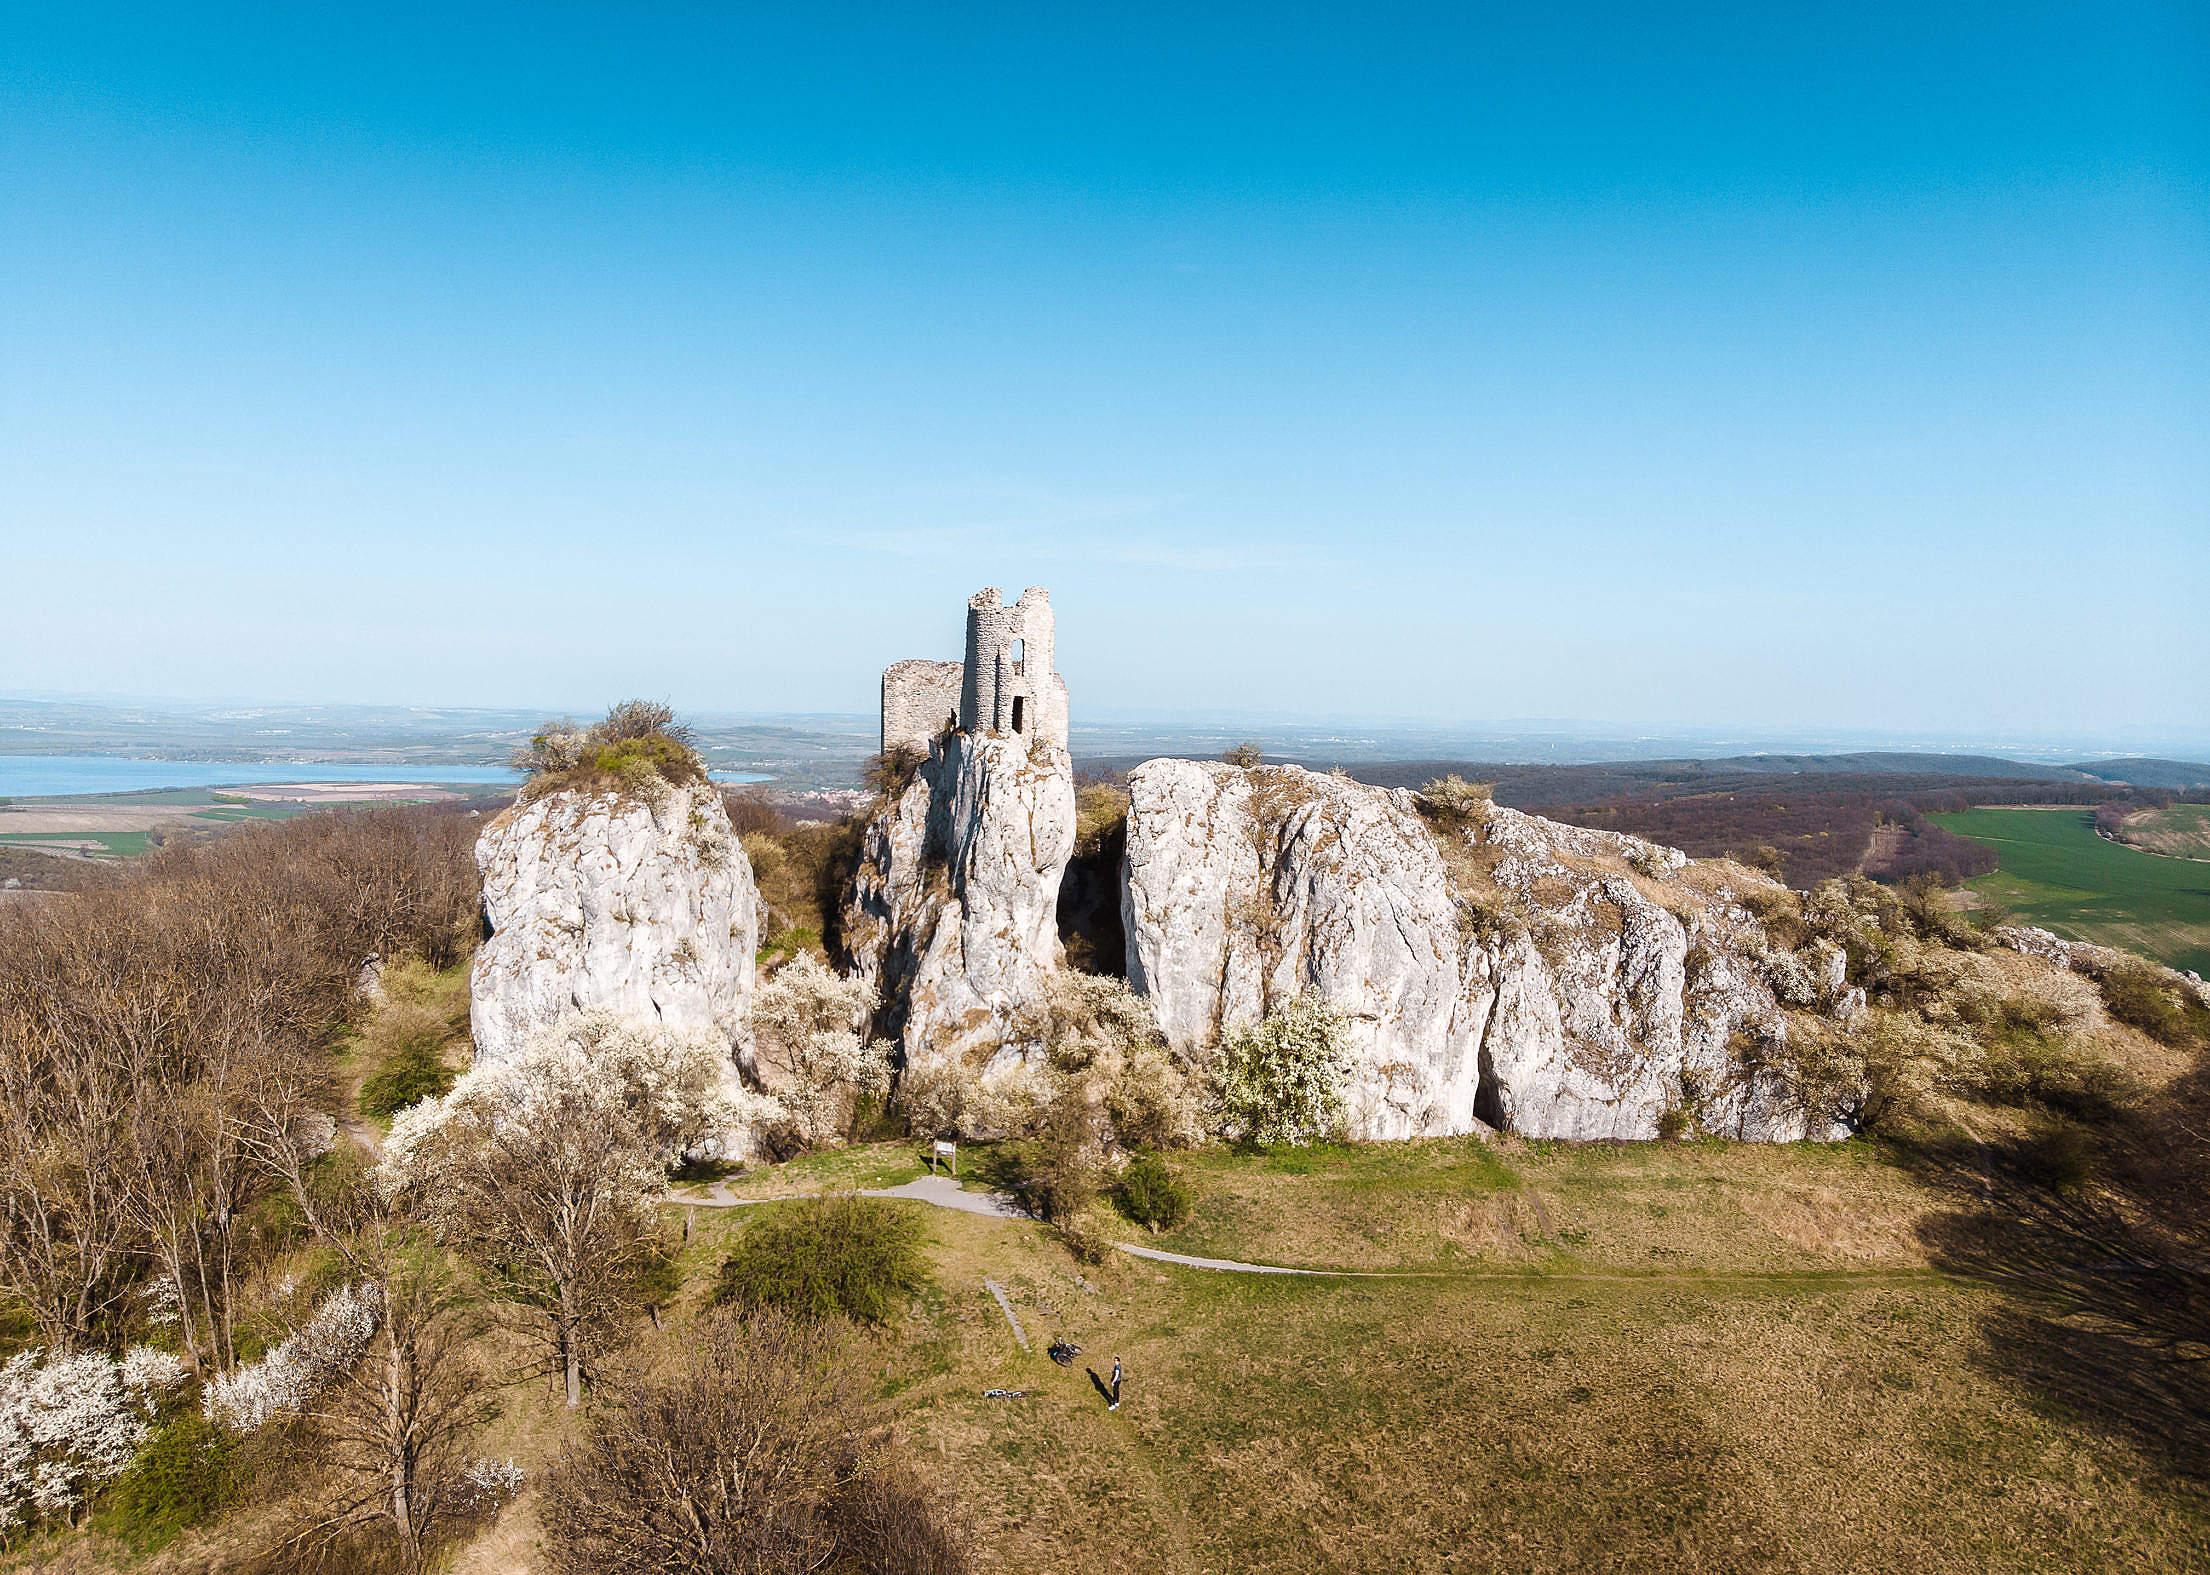 Sirotci Hradek Klentnice Ruins of Orphan's Castle Free Stock Photo